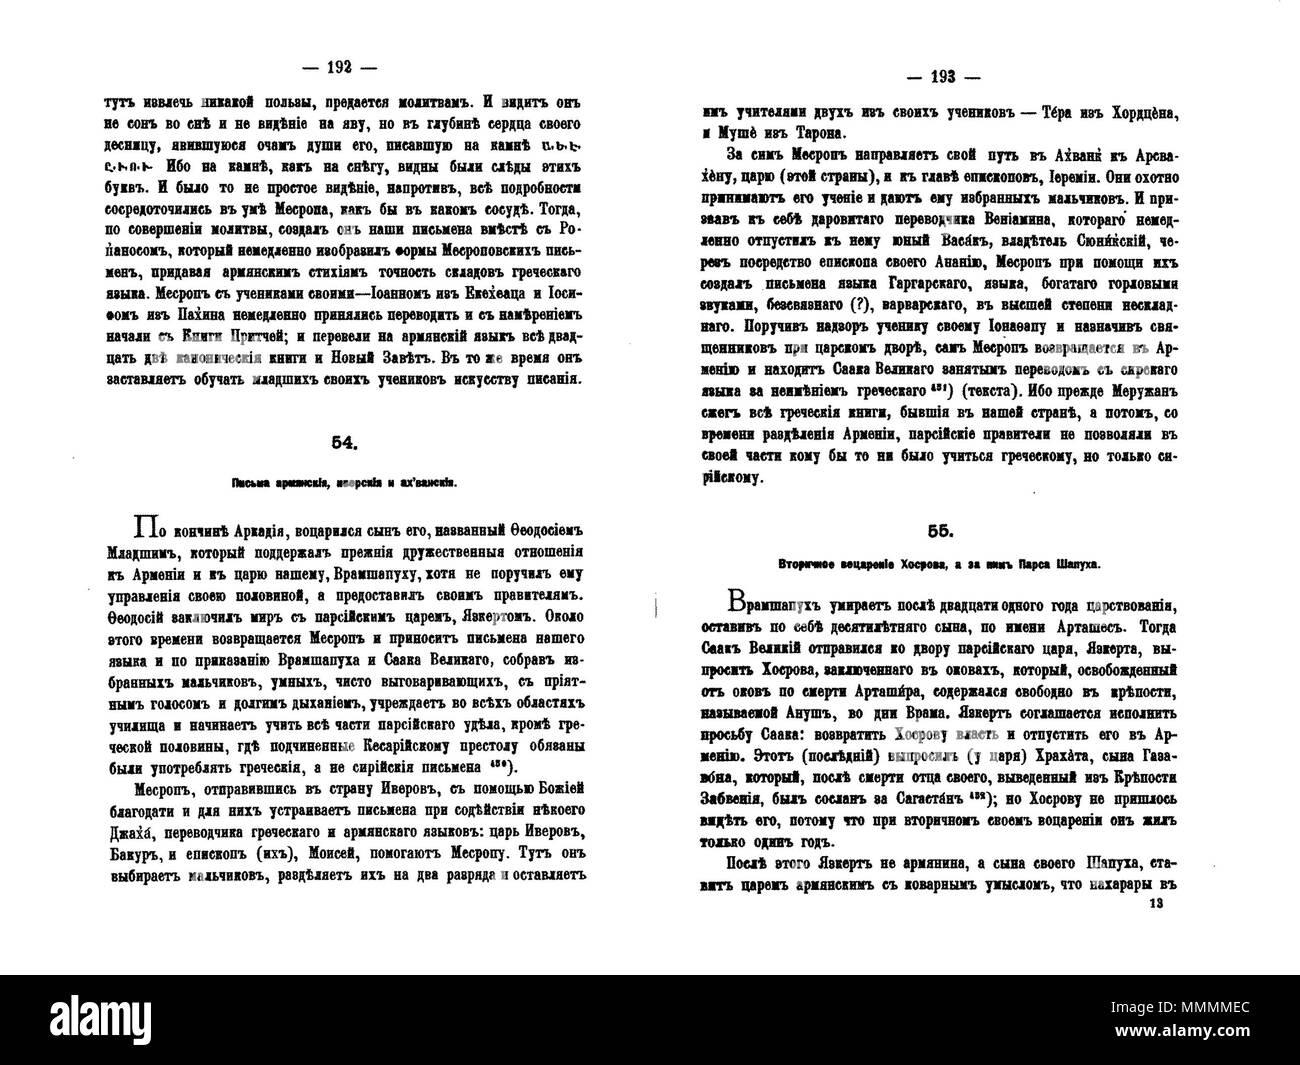 . English: History of Armenia - Movses Khorenatsi 1893 (page.192-193) Georgian alphabet  . 1893. Movses Khorenatsi History of Armenia - Movses Khorenatsi 1893 (page.192-193) - Stock Image